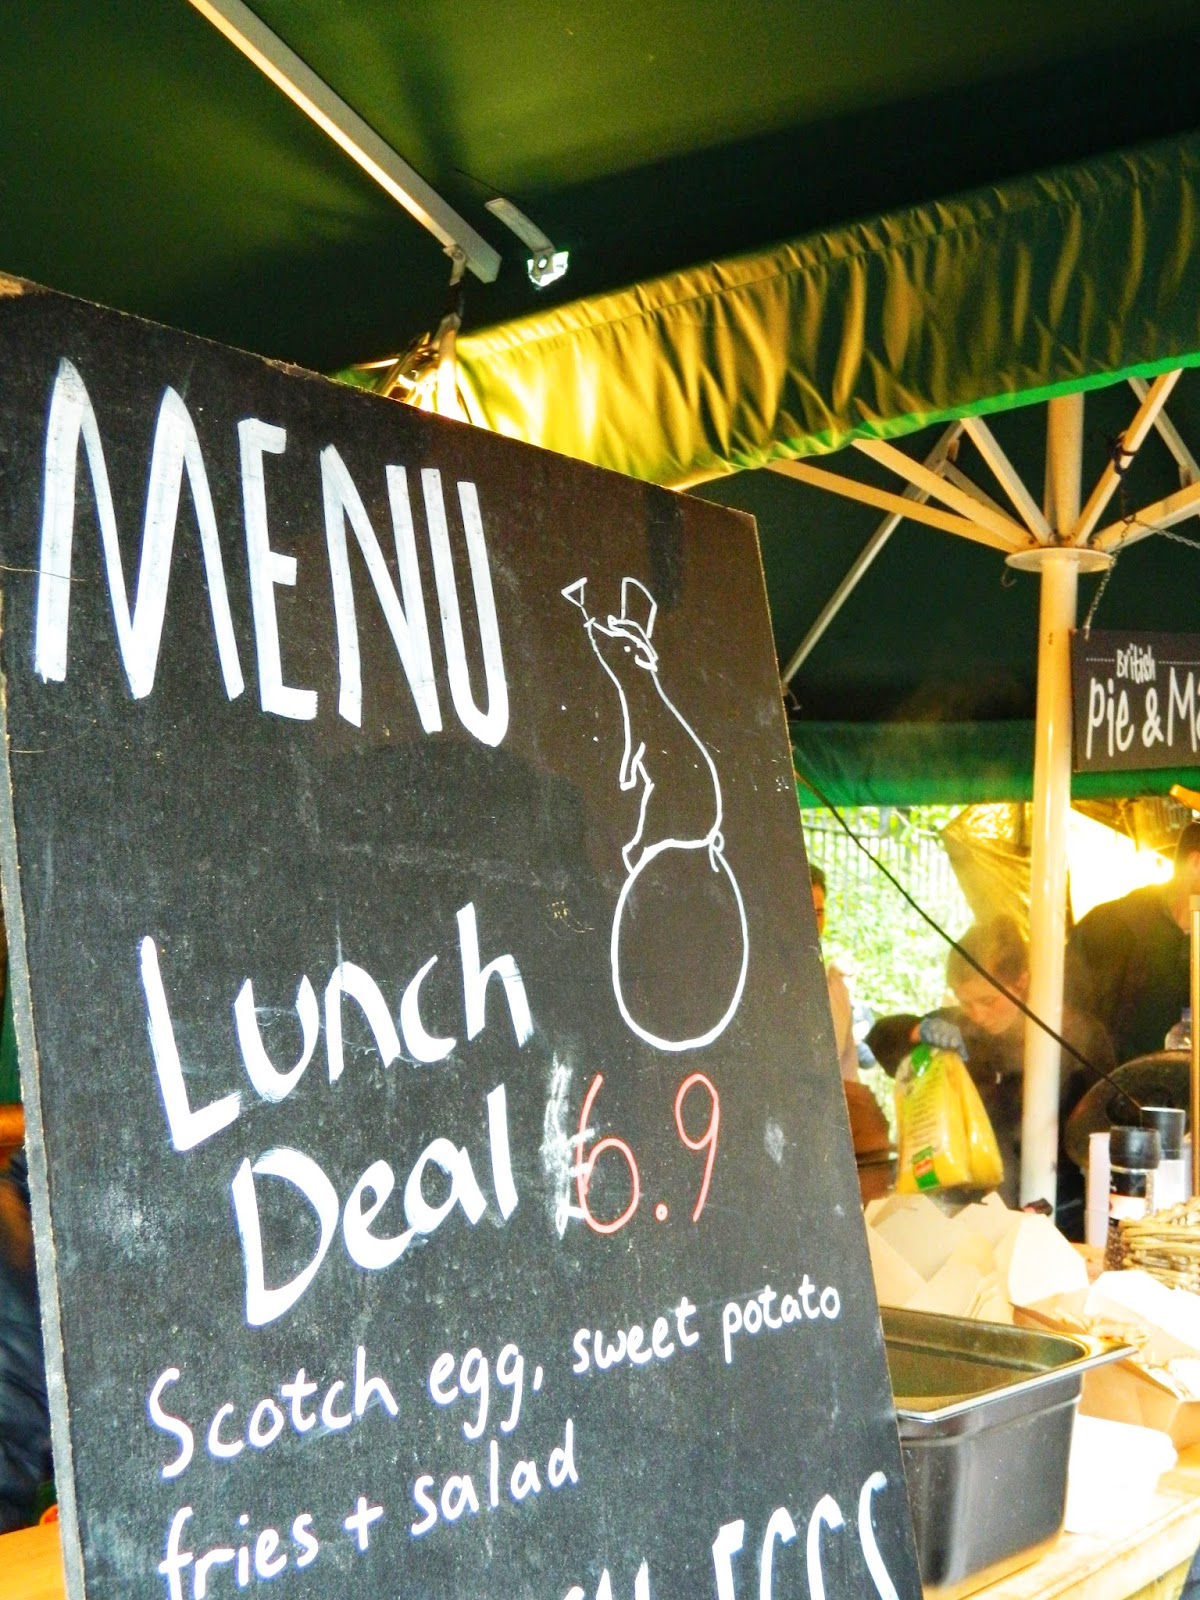 borough market chalk board menu lunch scotch egg sweet potato fires